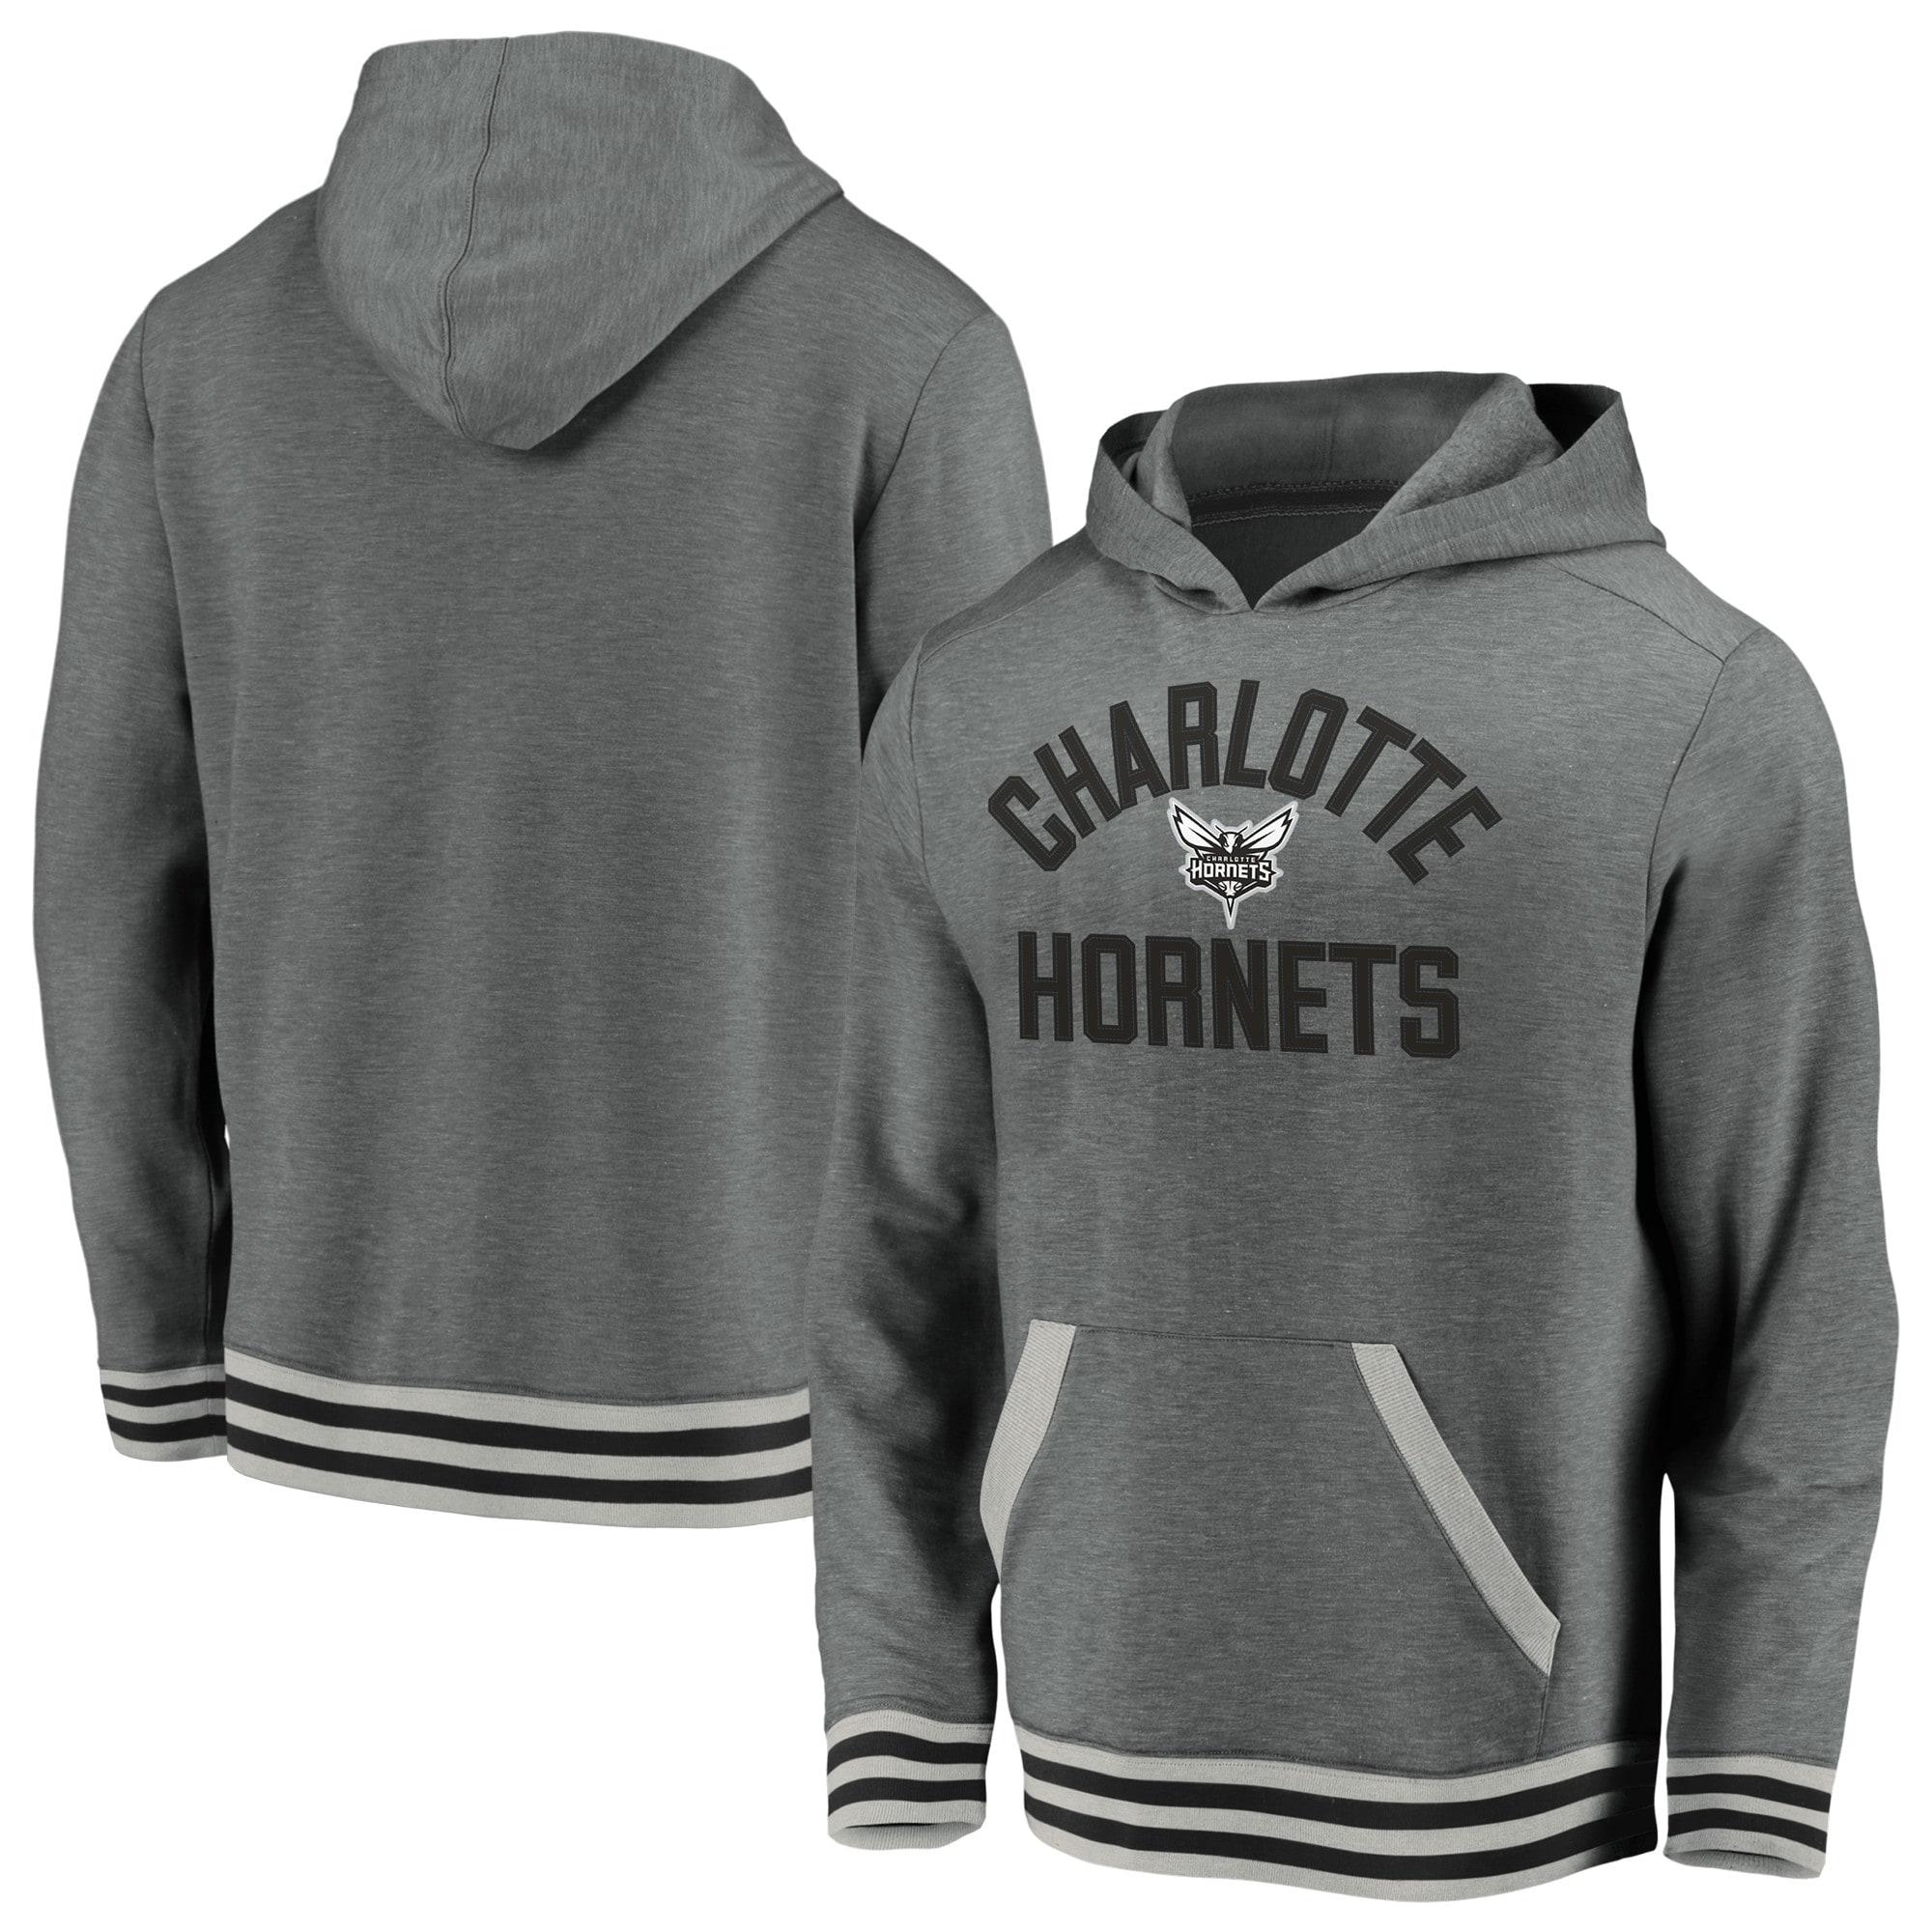 Charlotte Hornets Fanatics Branded True Classics Vintage Upperclassman Tri-Blend Pullover Hoodie - Gray